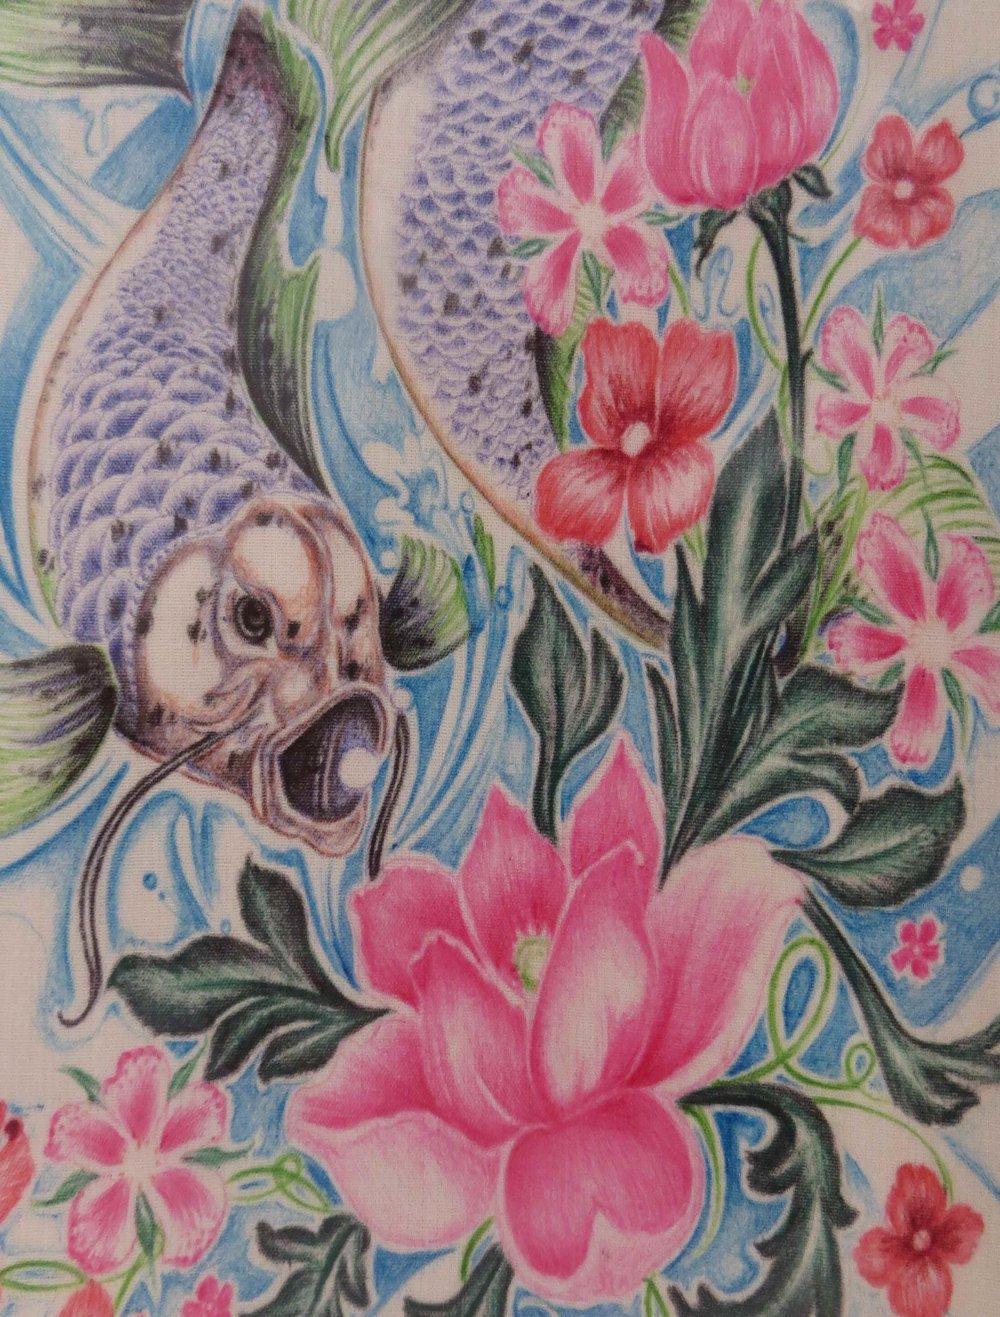 koi fish drawing-koi fish drawing-006 - Copy.jpg